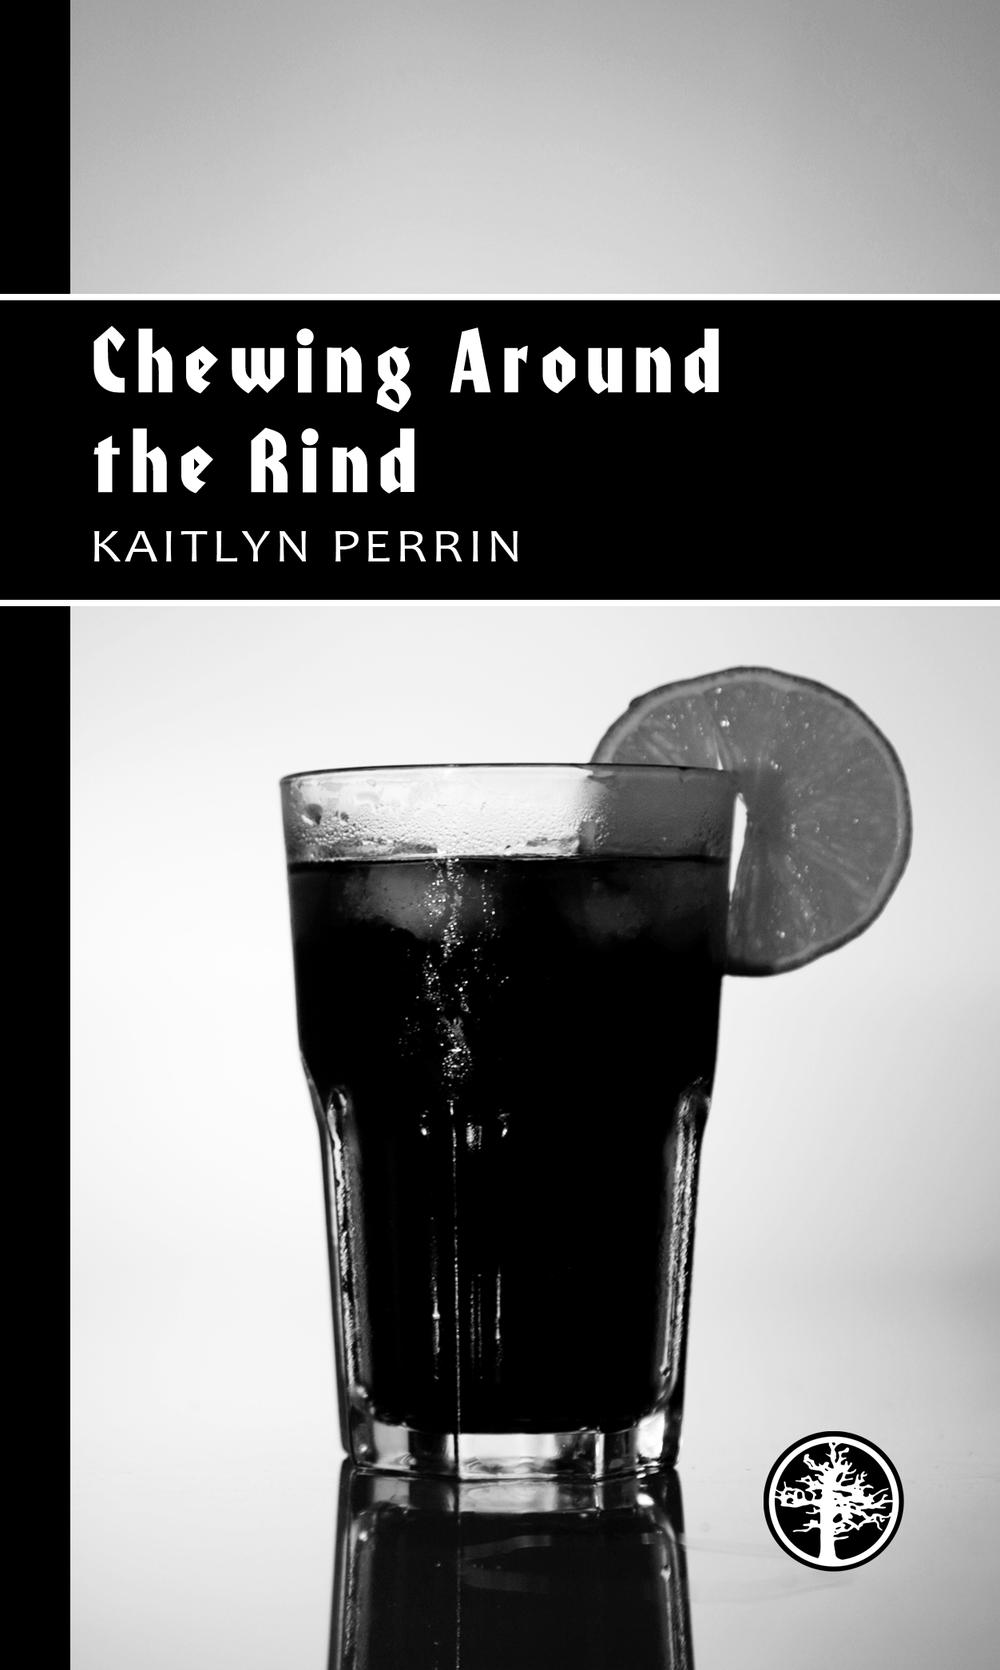 ChewingAroundtheRindCover